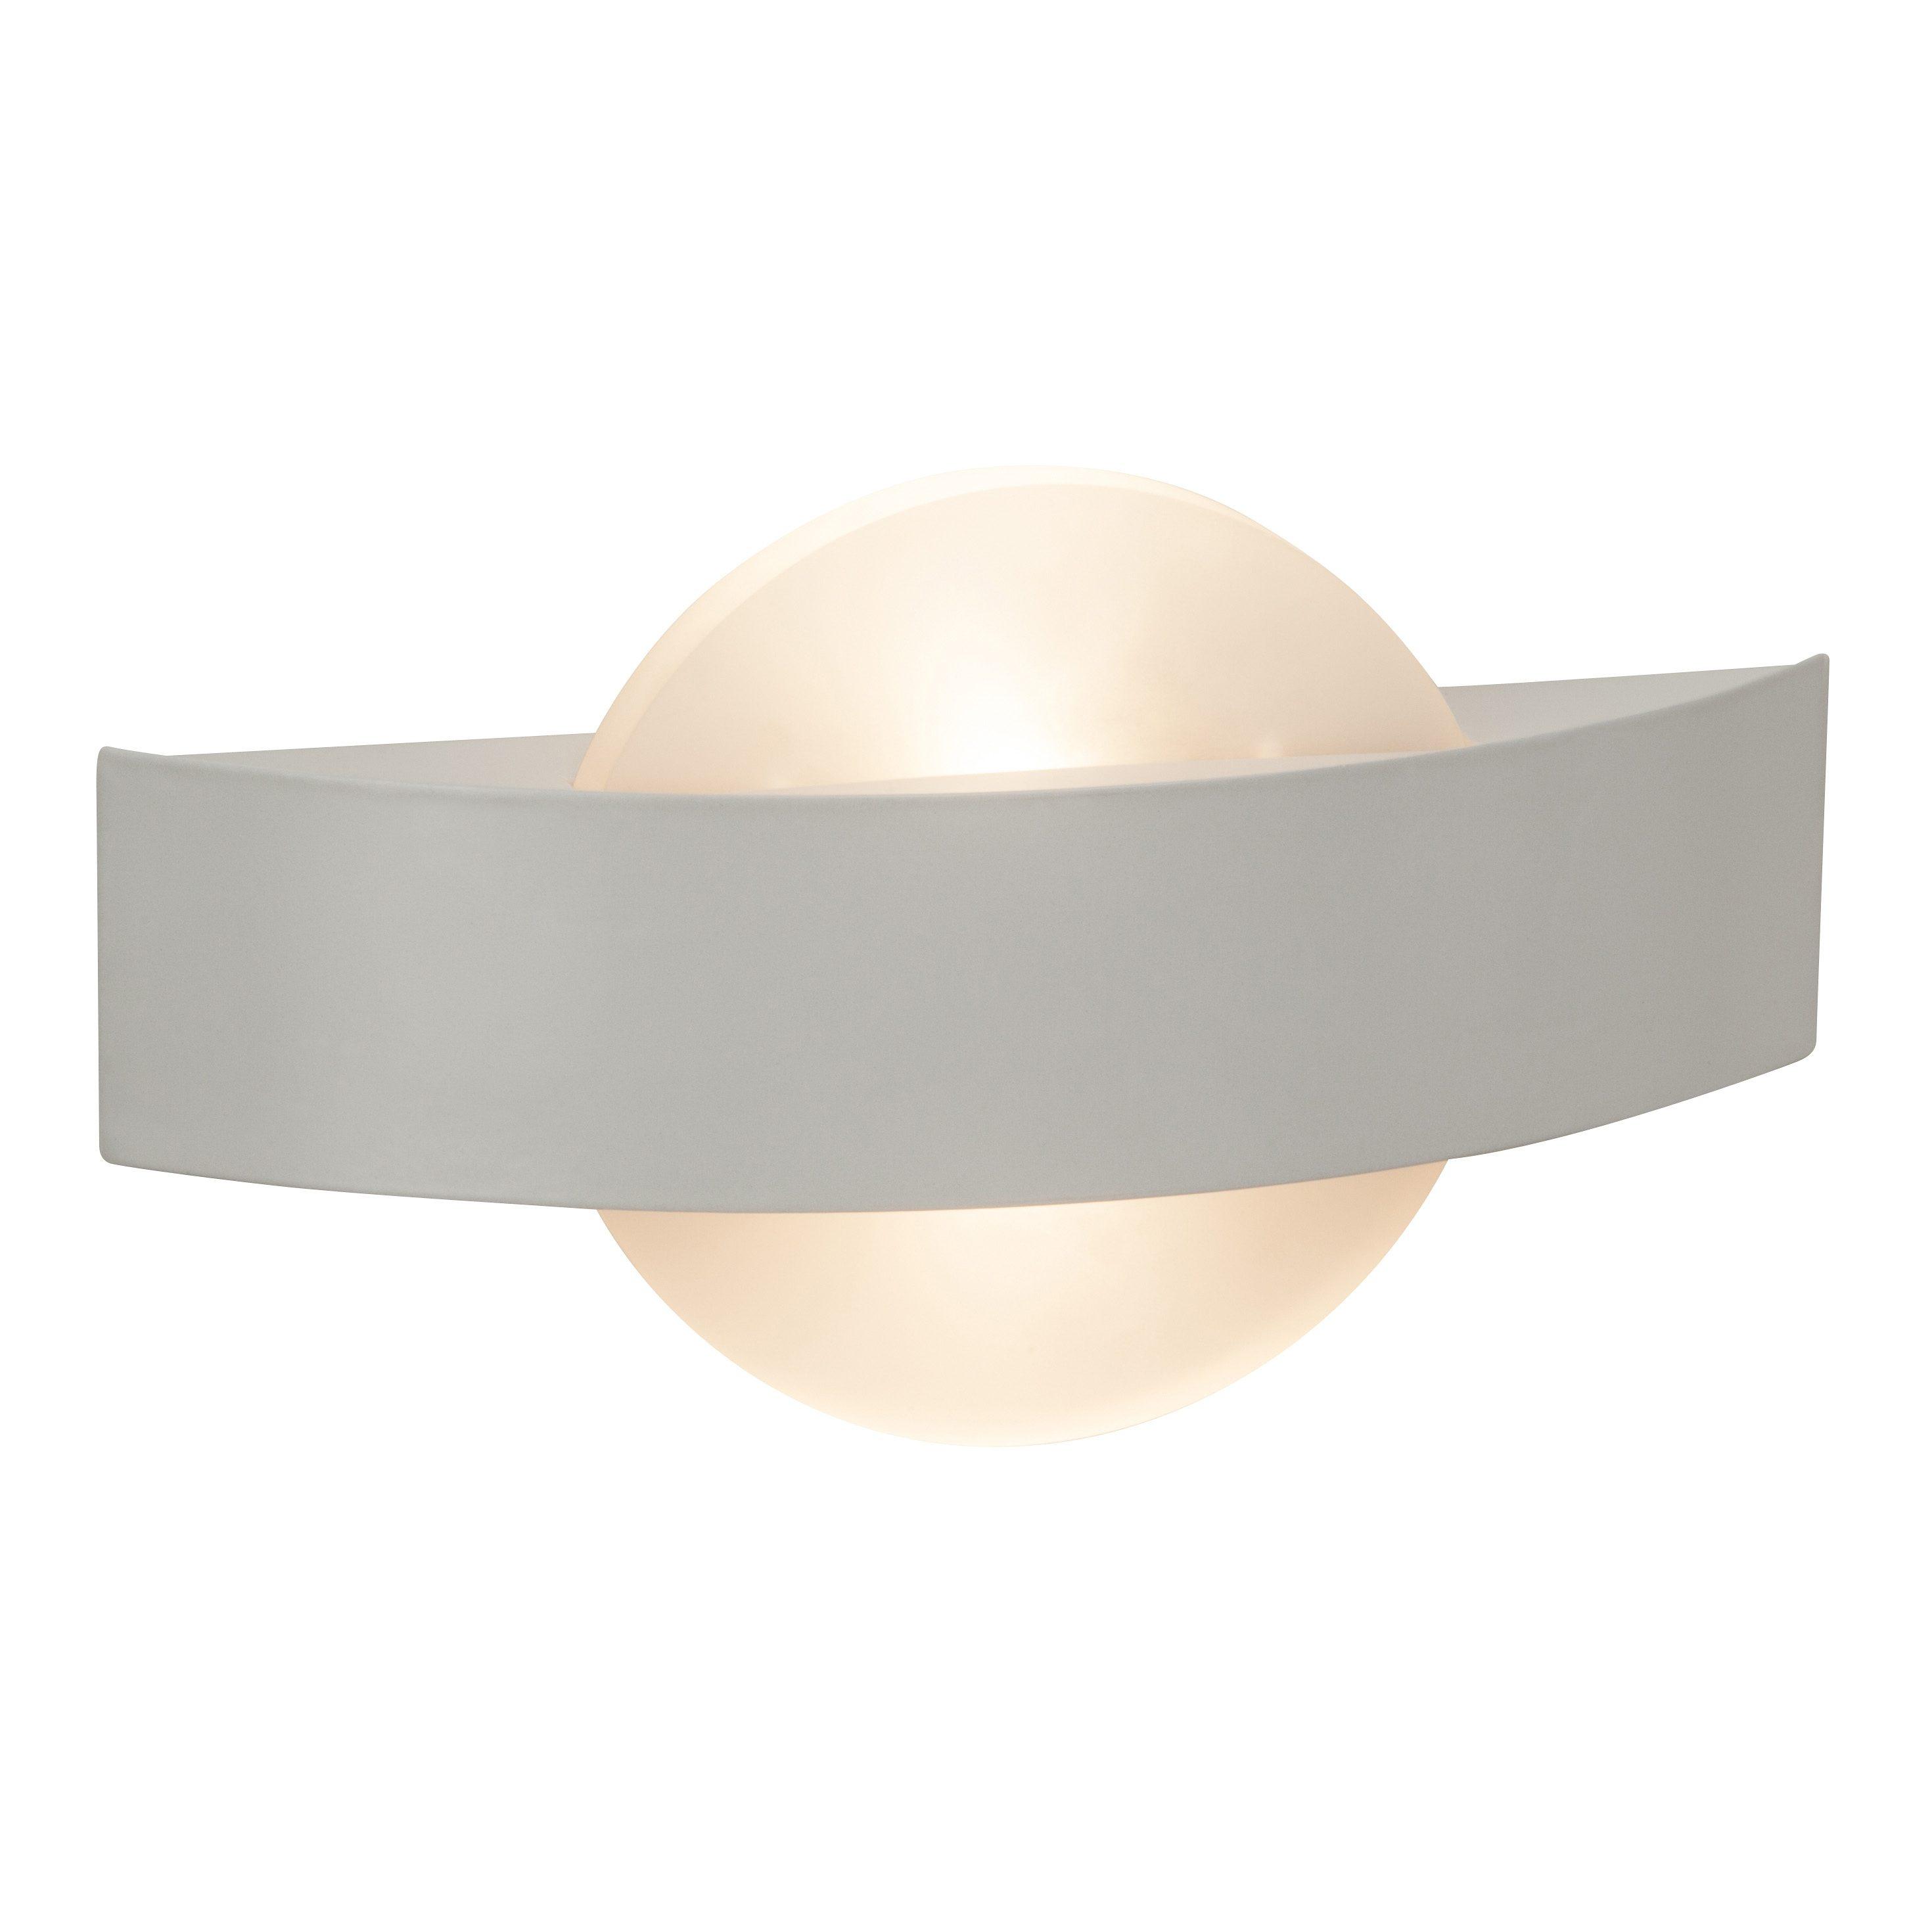 Brilliant Leuchten LED-Wandleuchte, inkl. LED-Leuchtmittel, 2 flammig